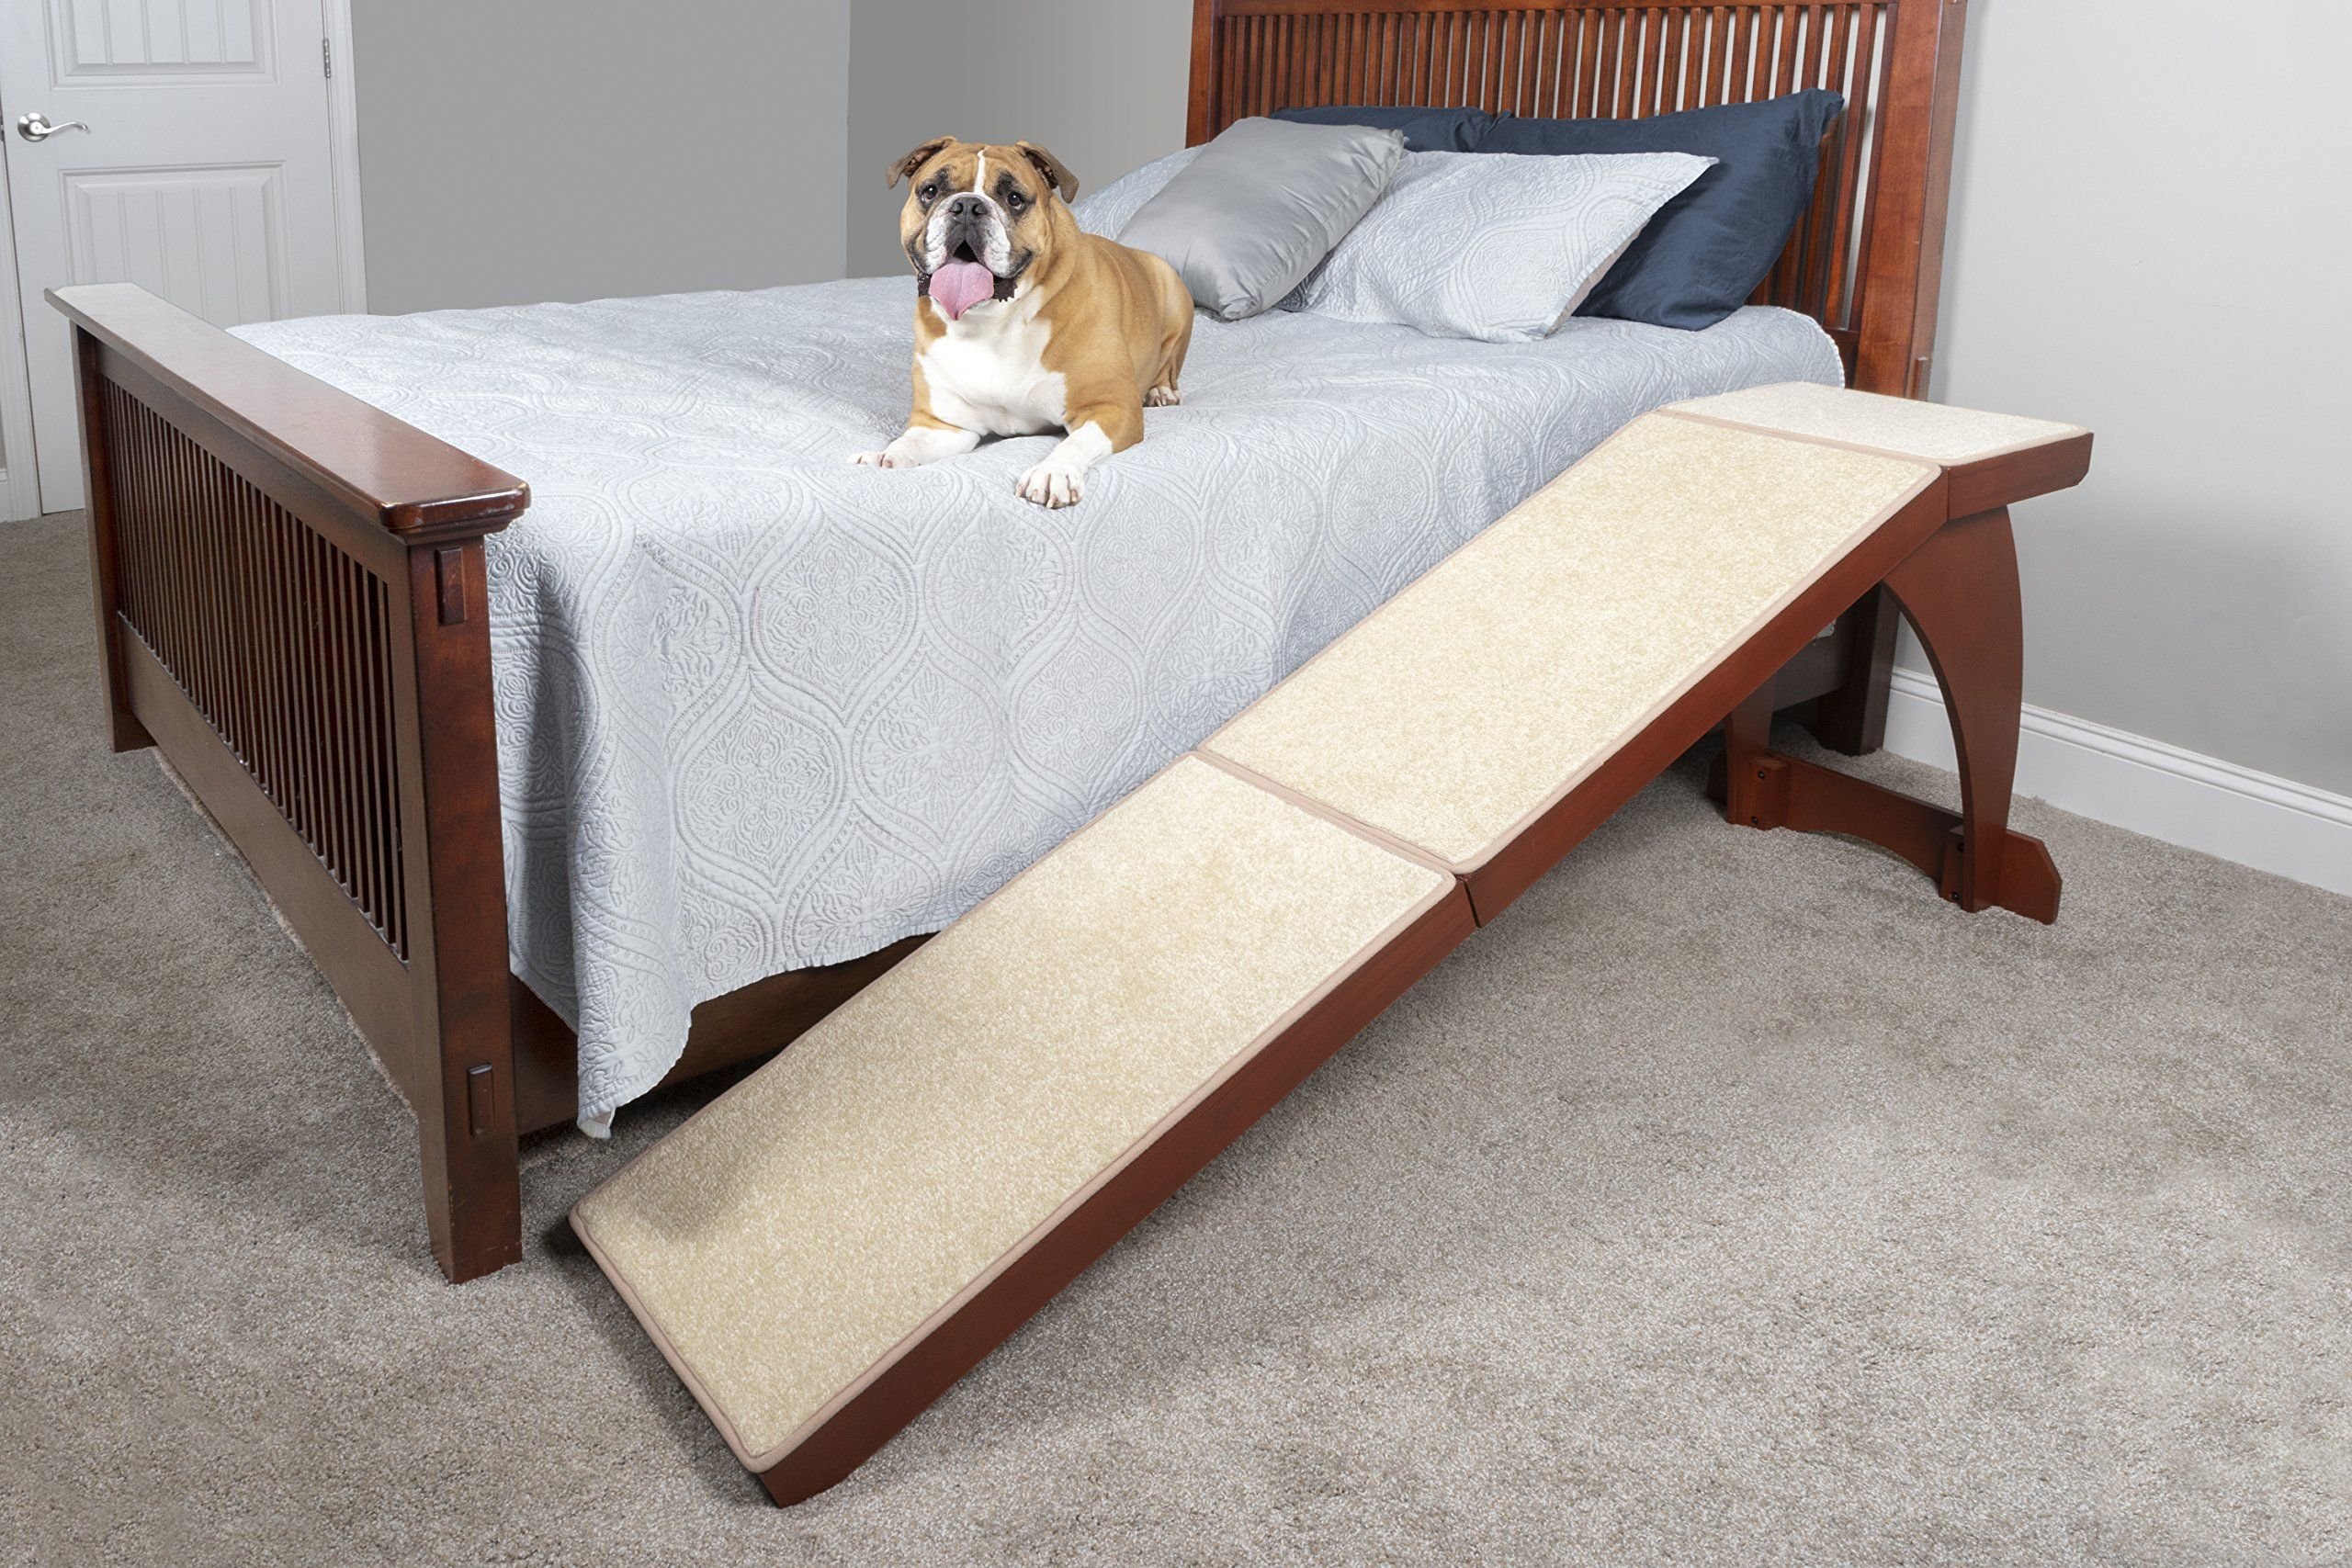 Solvit Wood Bedside Ramp Ad Wood Solvit Ramp Bedside Pet Ramp Dog Stairs Dog Ramp For Bed